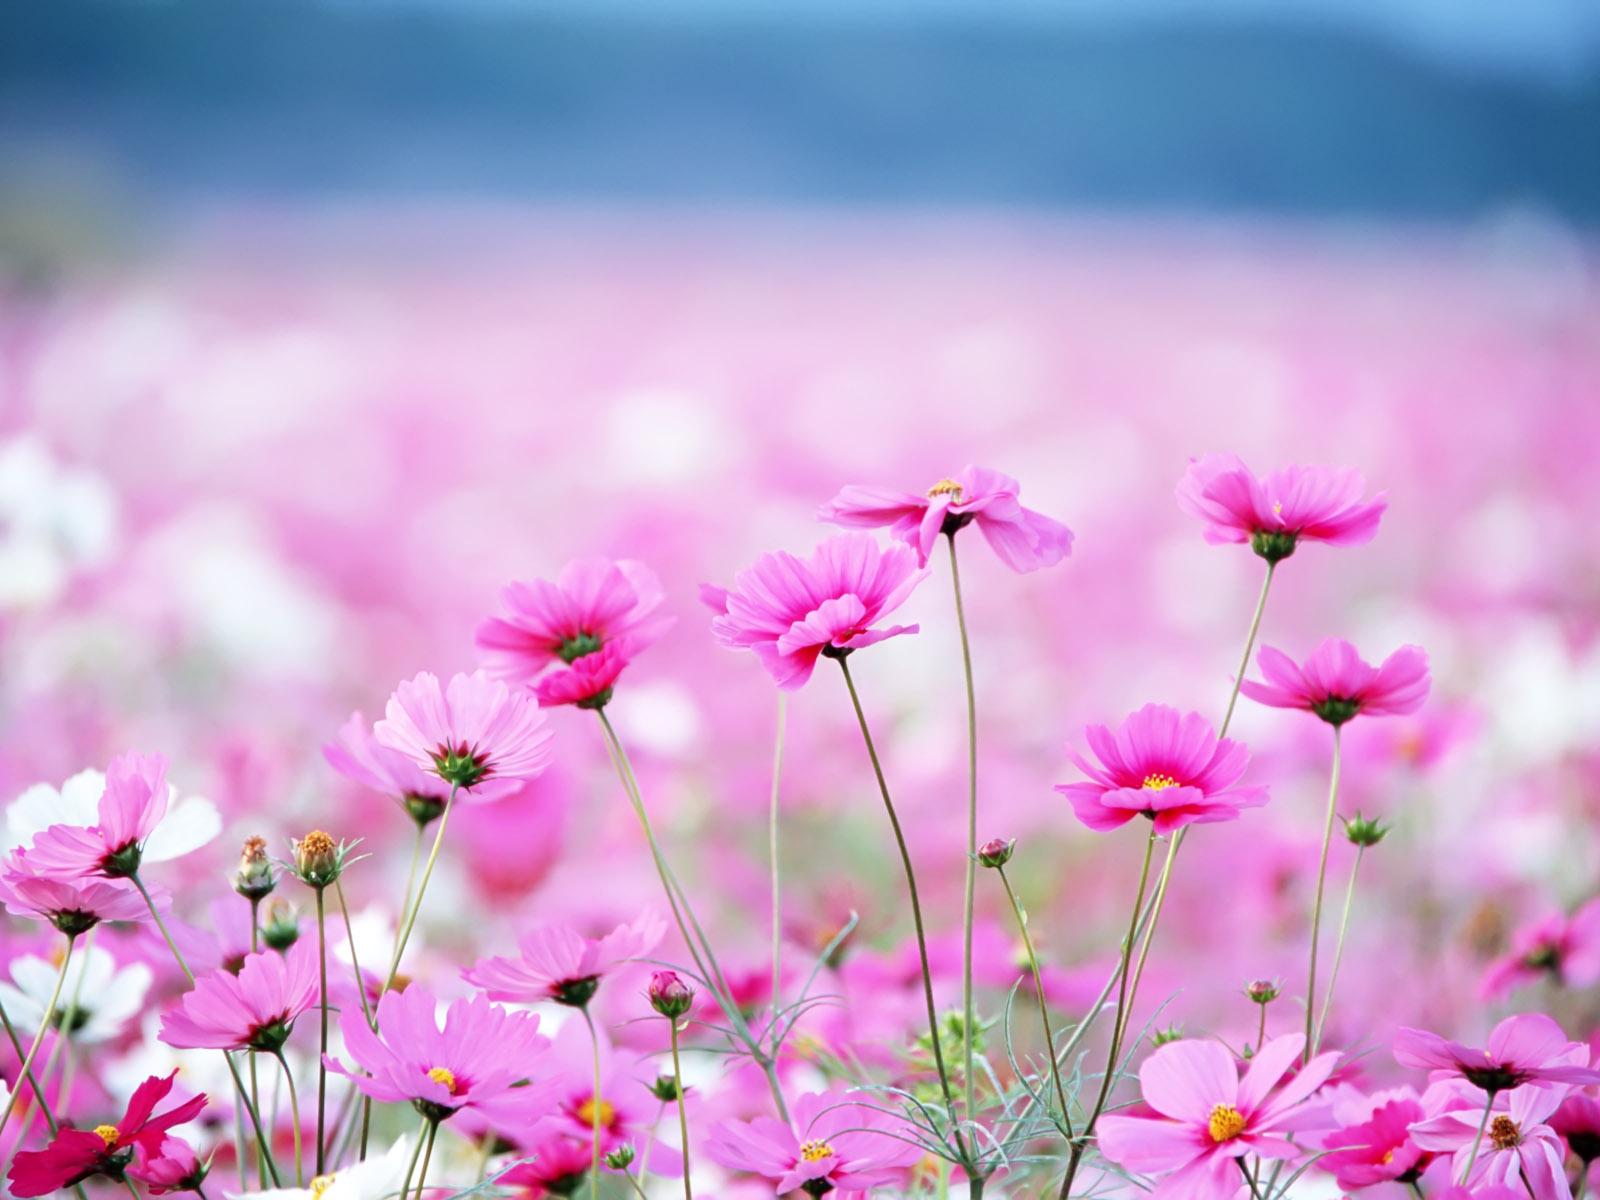 Wallpaper Spring Pink Flower 1600x1200